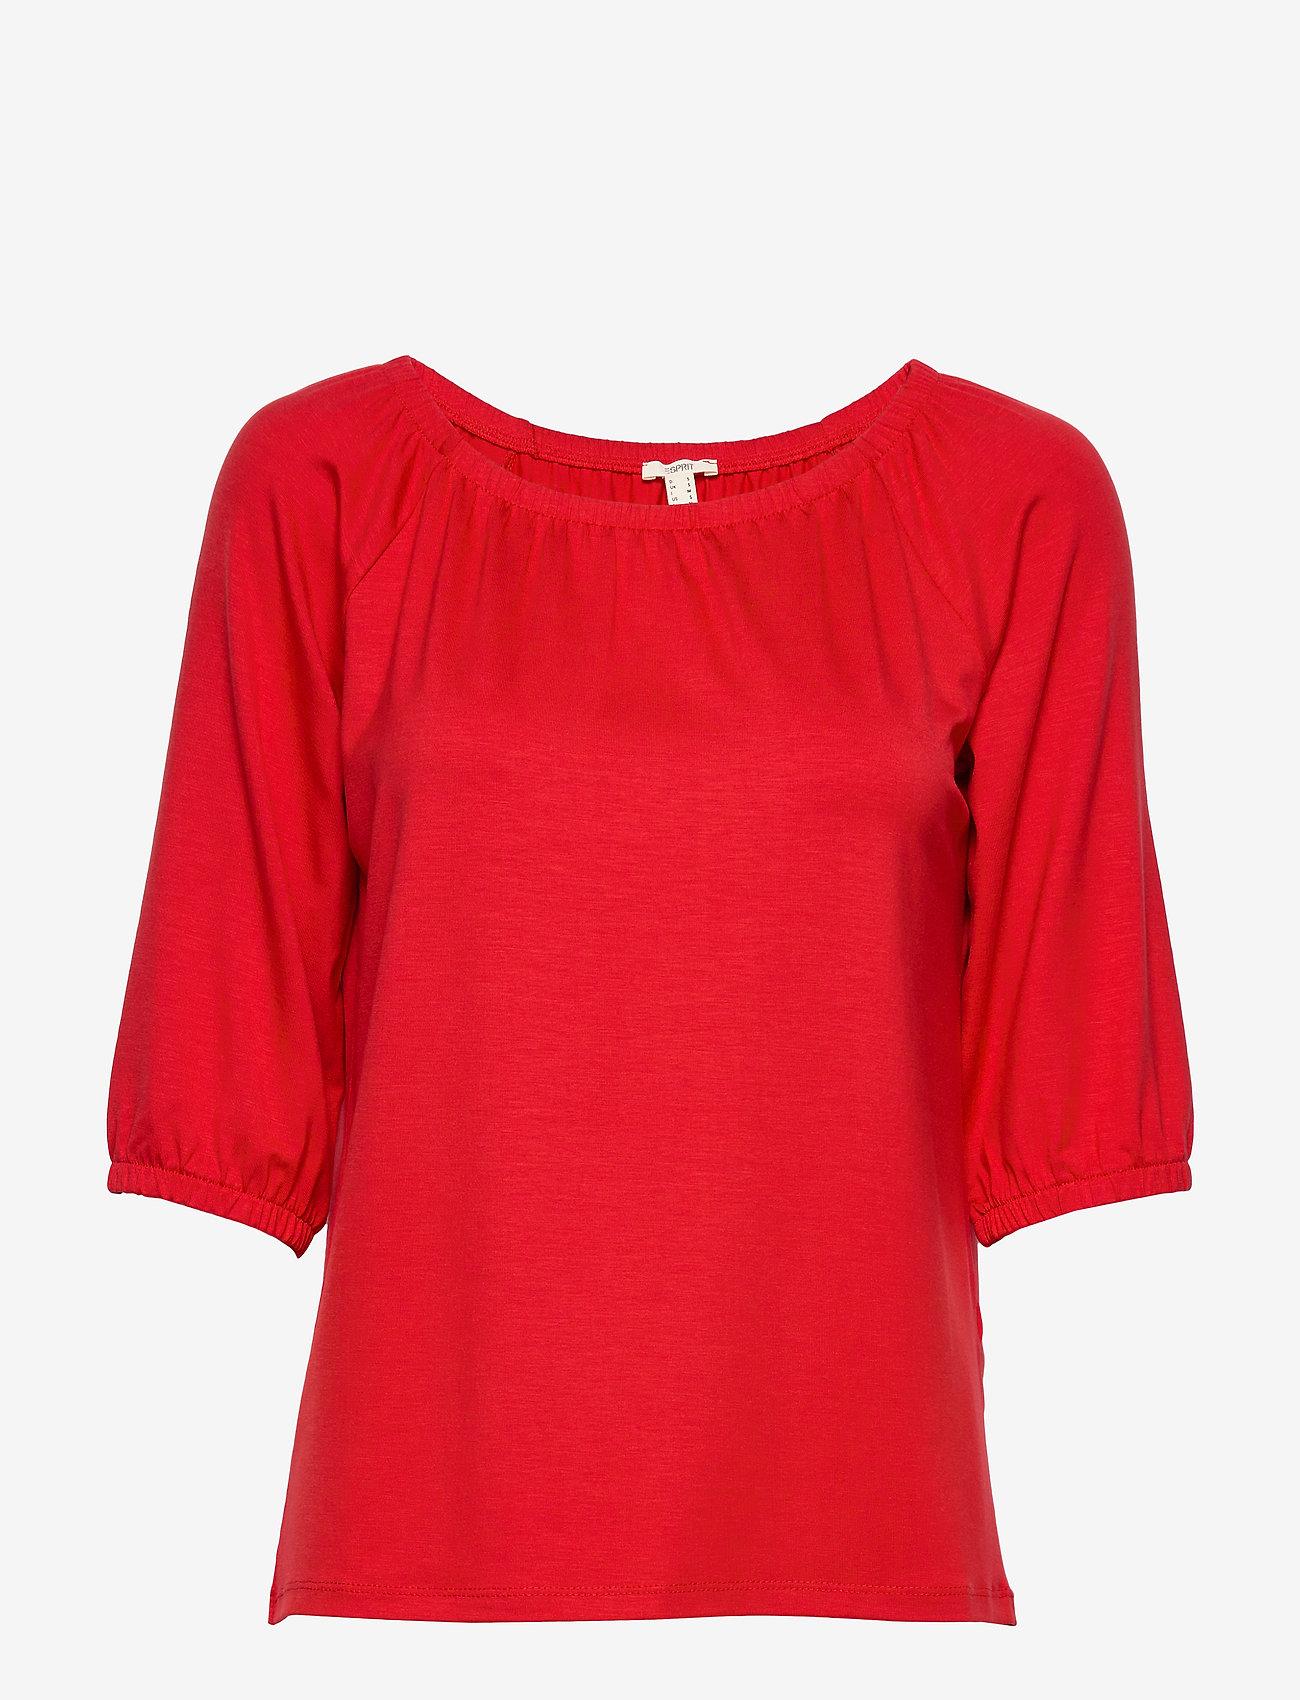 Esprit Casual - T-Shirts - basic t-shirts - dark red - 1